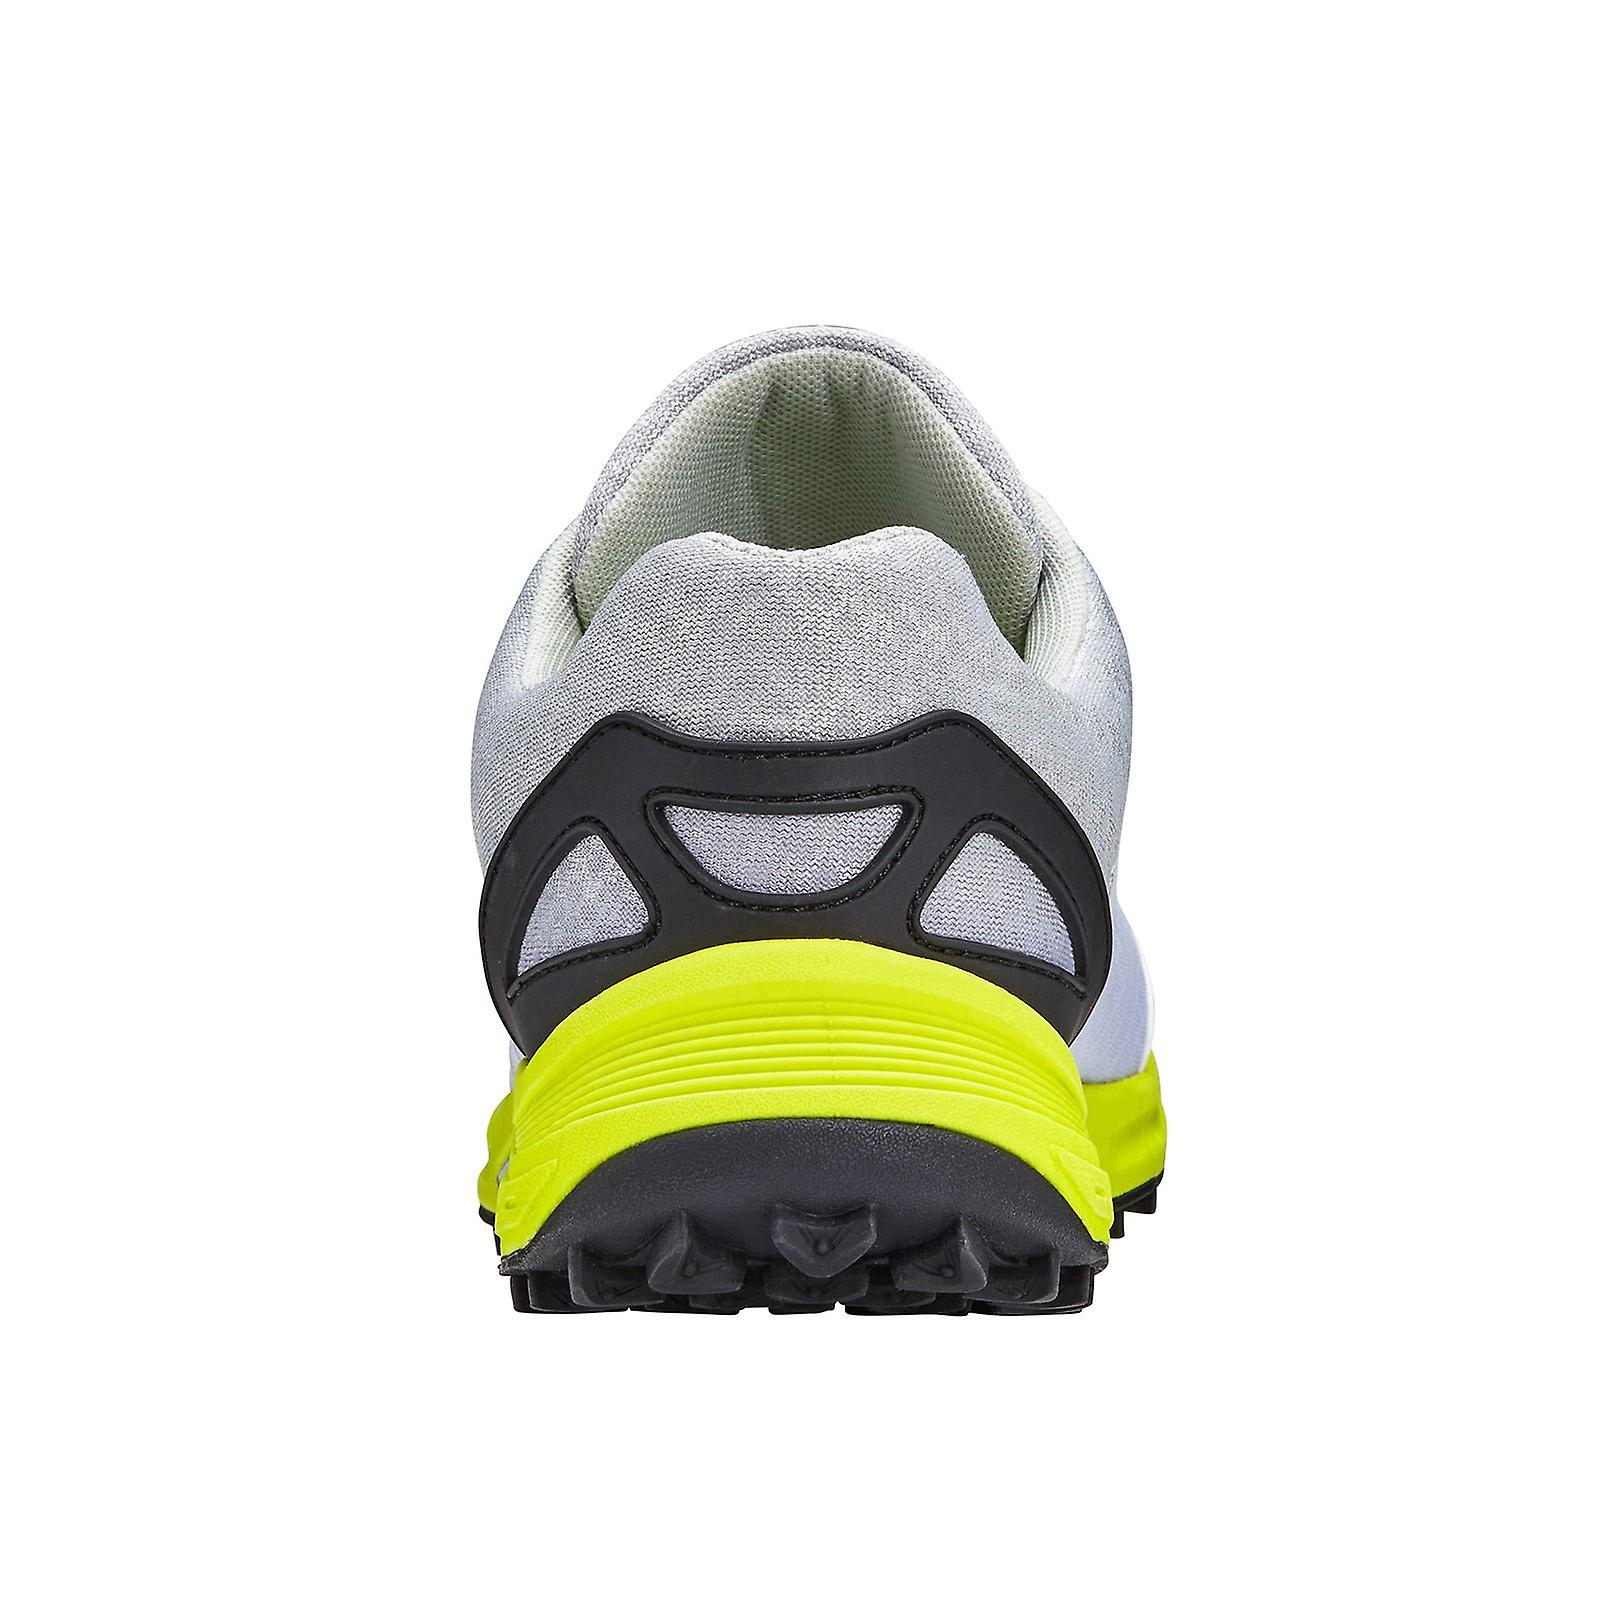 Gunn & Moore 2019 All Rounder Mens Adult Cricket Shoe White/Lime